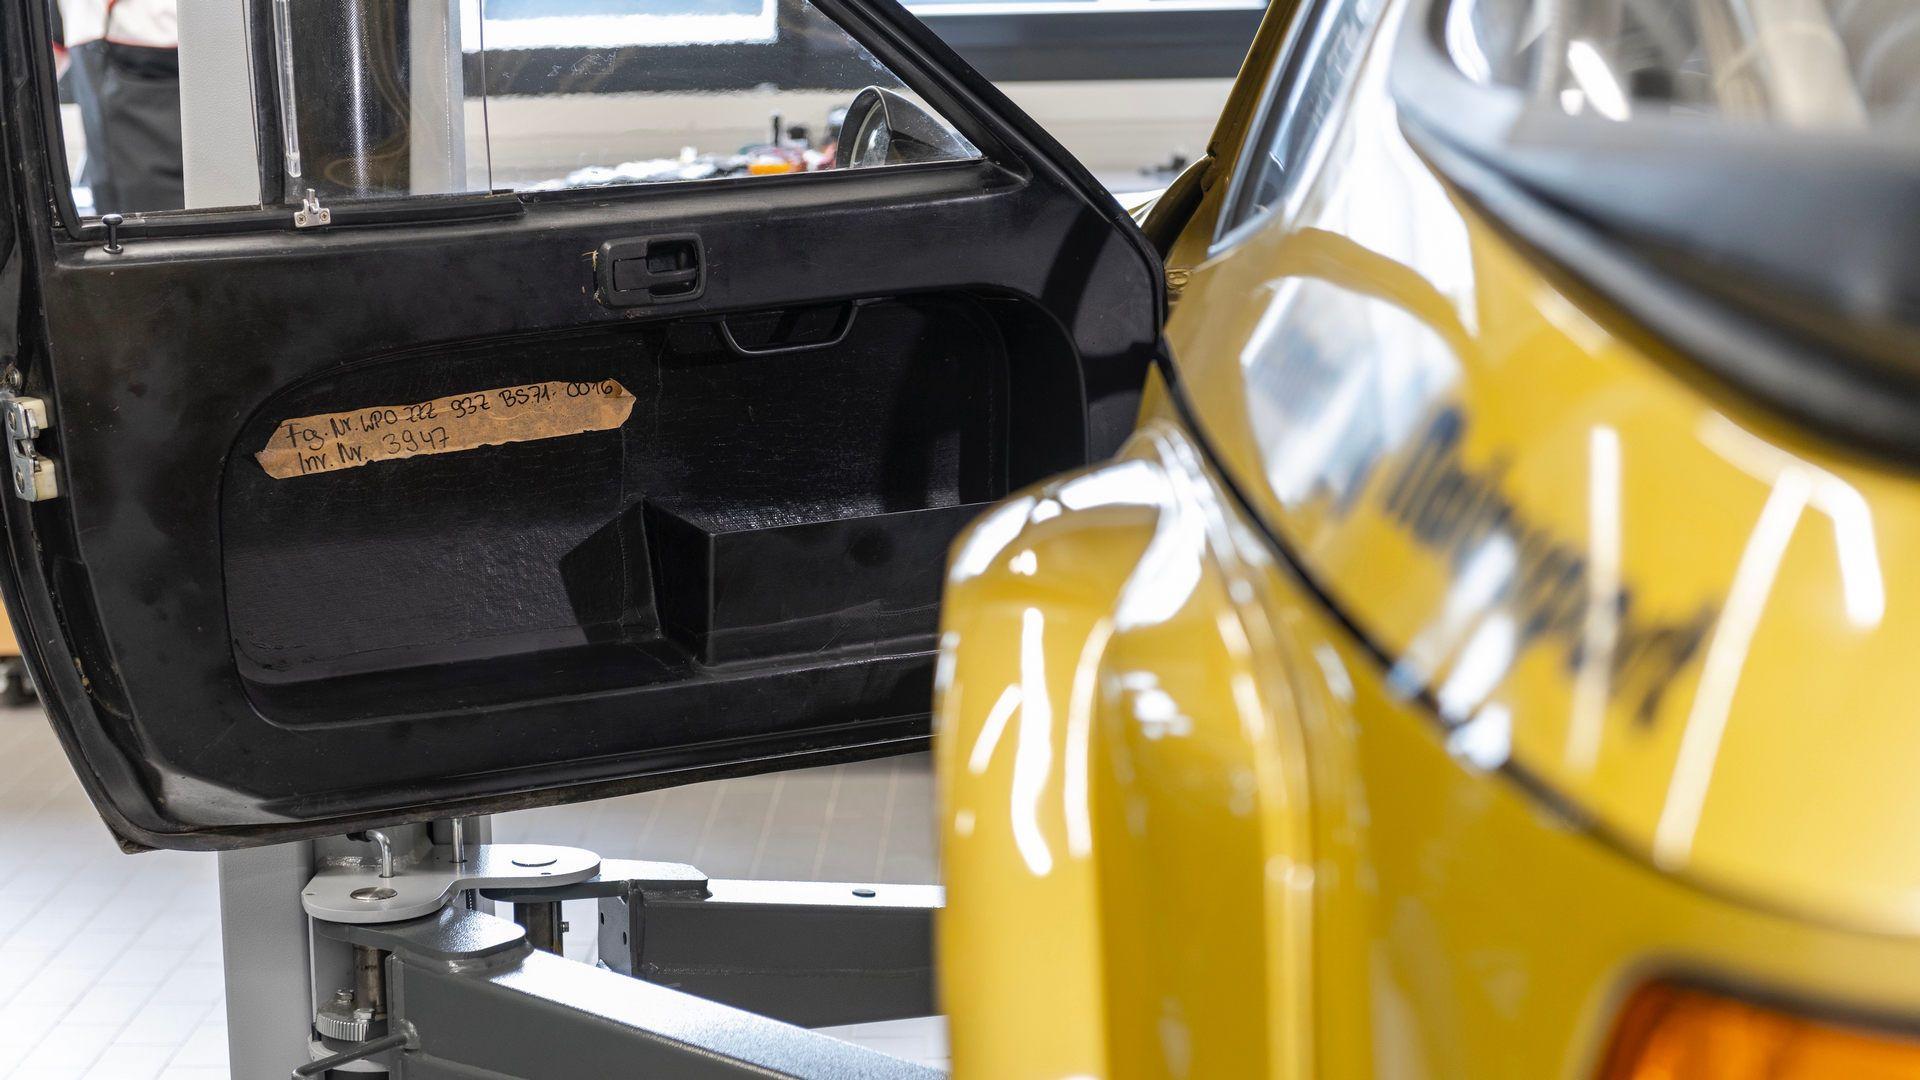 Porsche-924-Carrera-GTS-rally-car-Walter-Rohrl-35